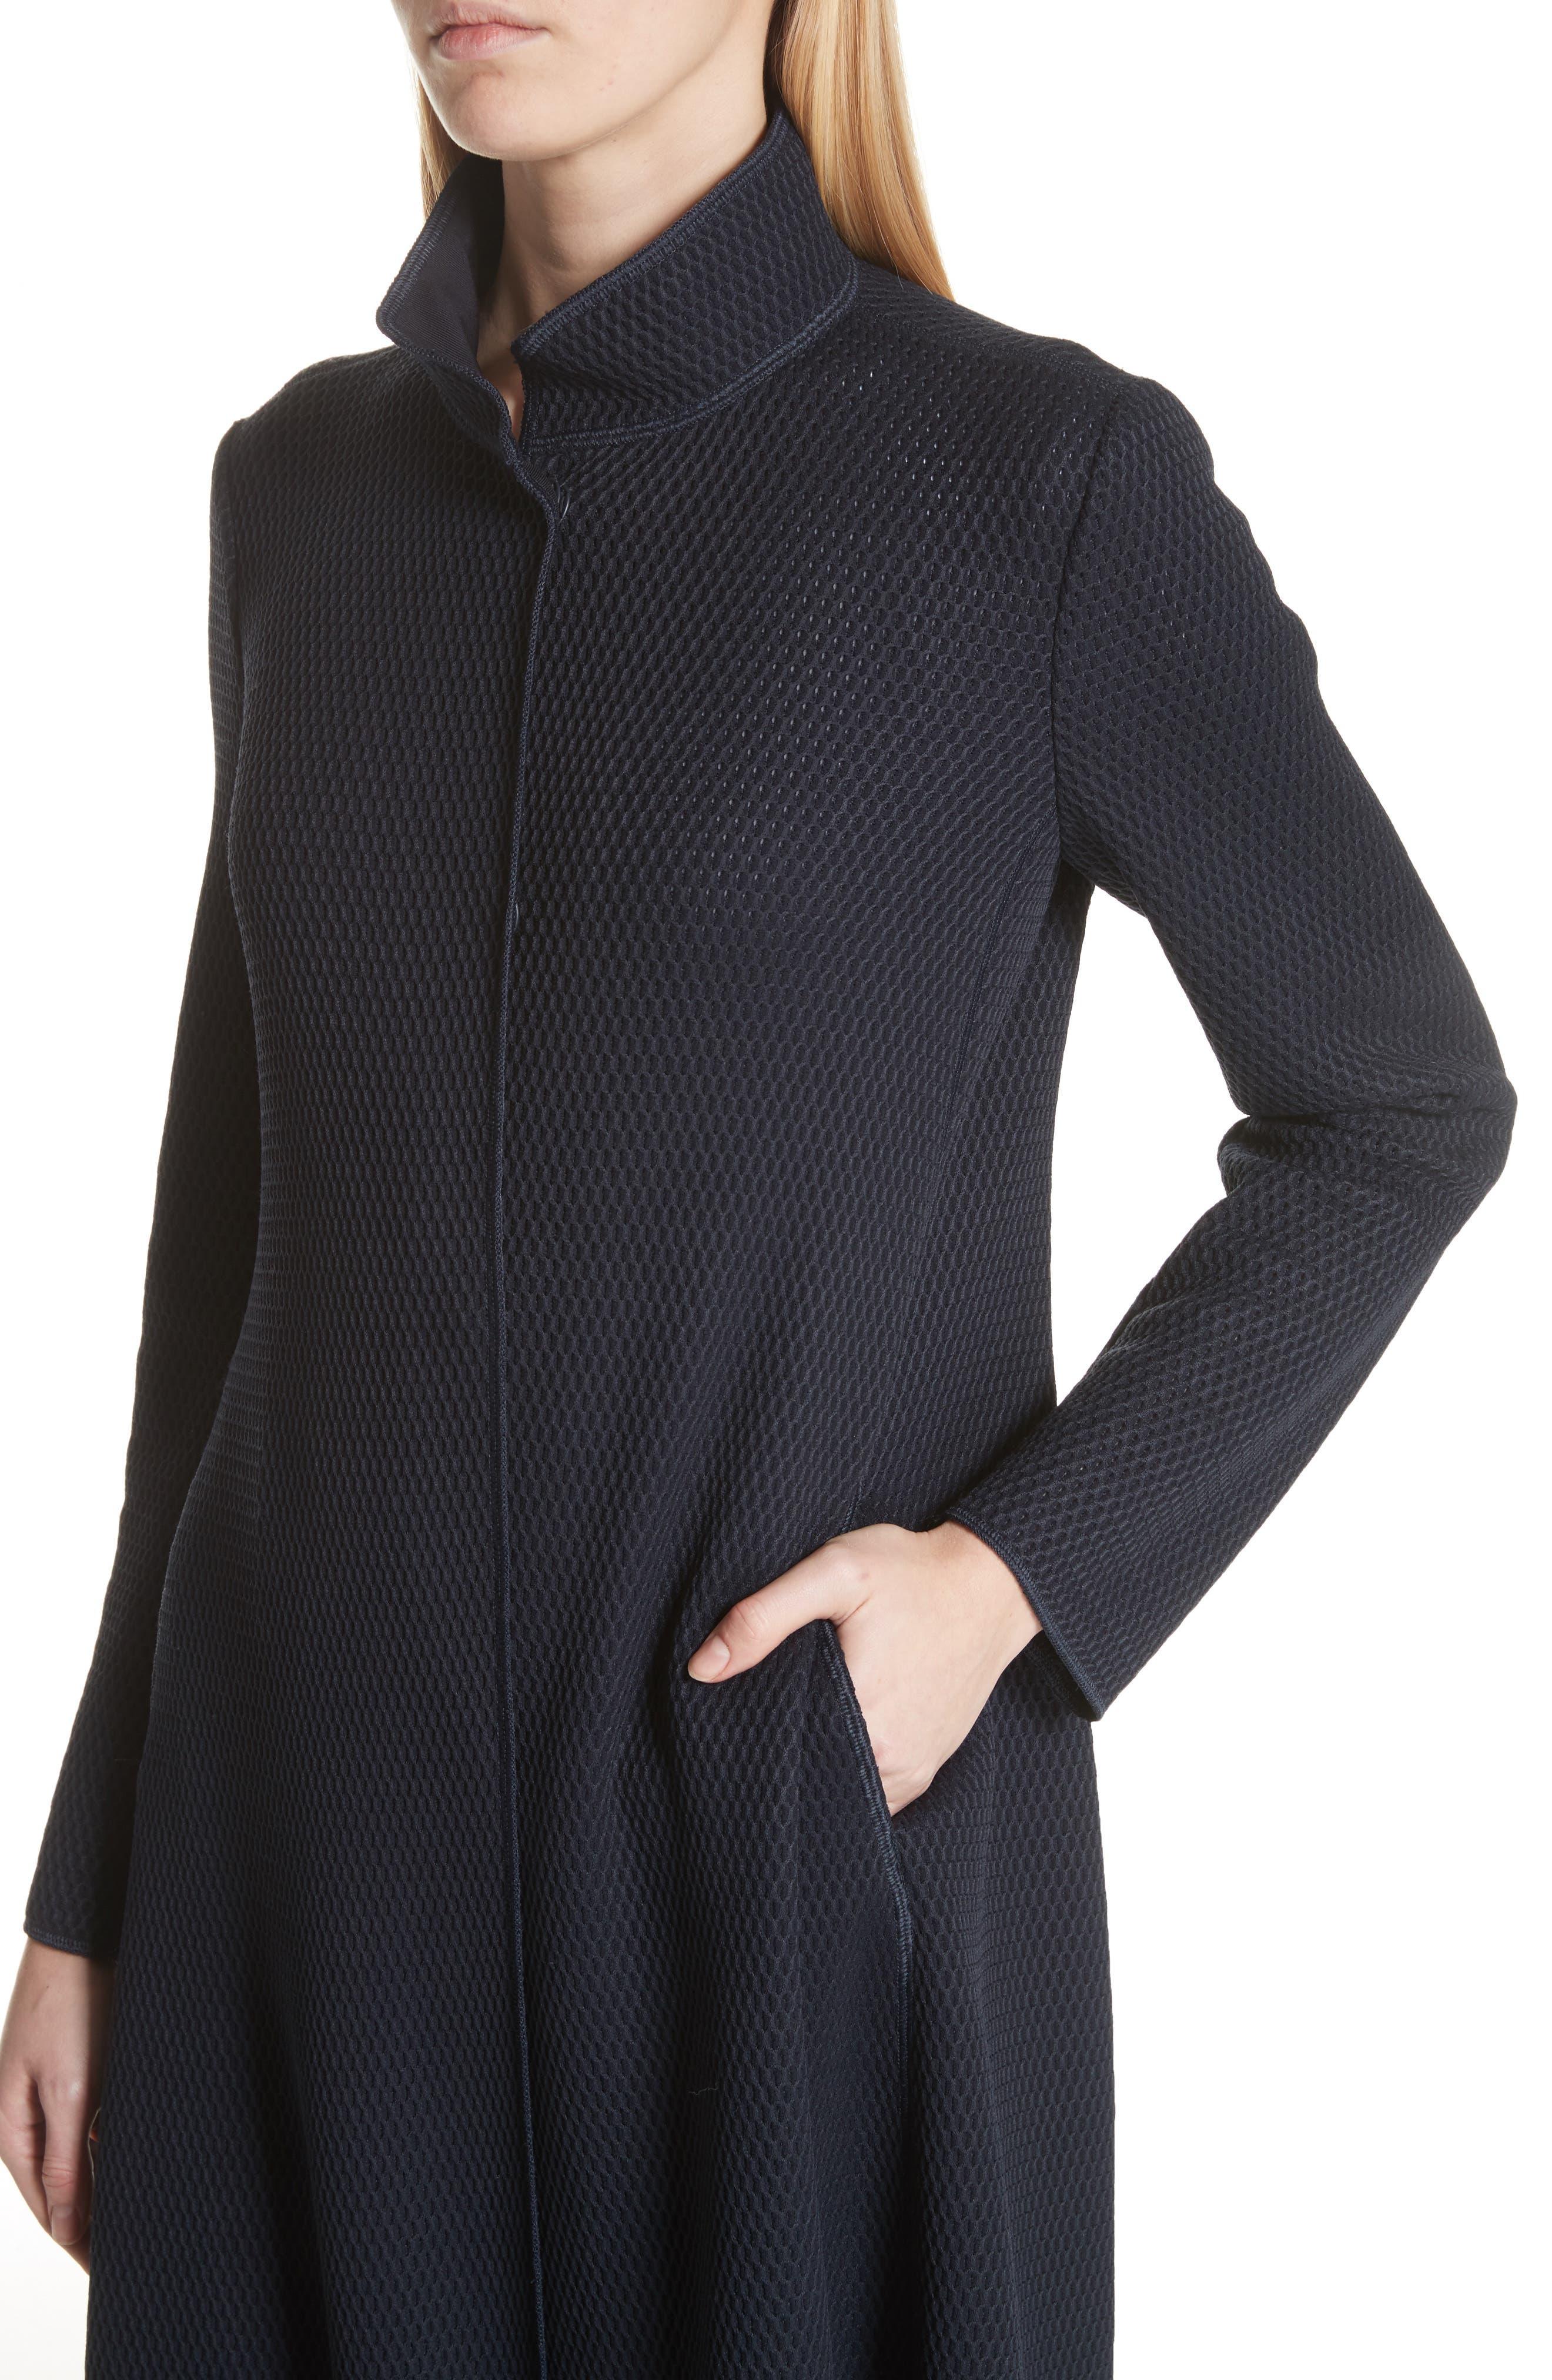 Honeycomb Knit Jersey Coat,                             Alternate thumbnail 4, color,                             Navy